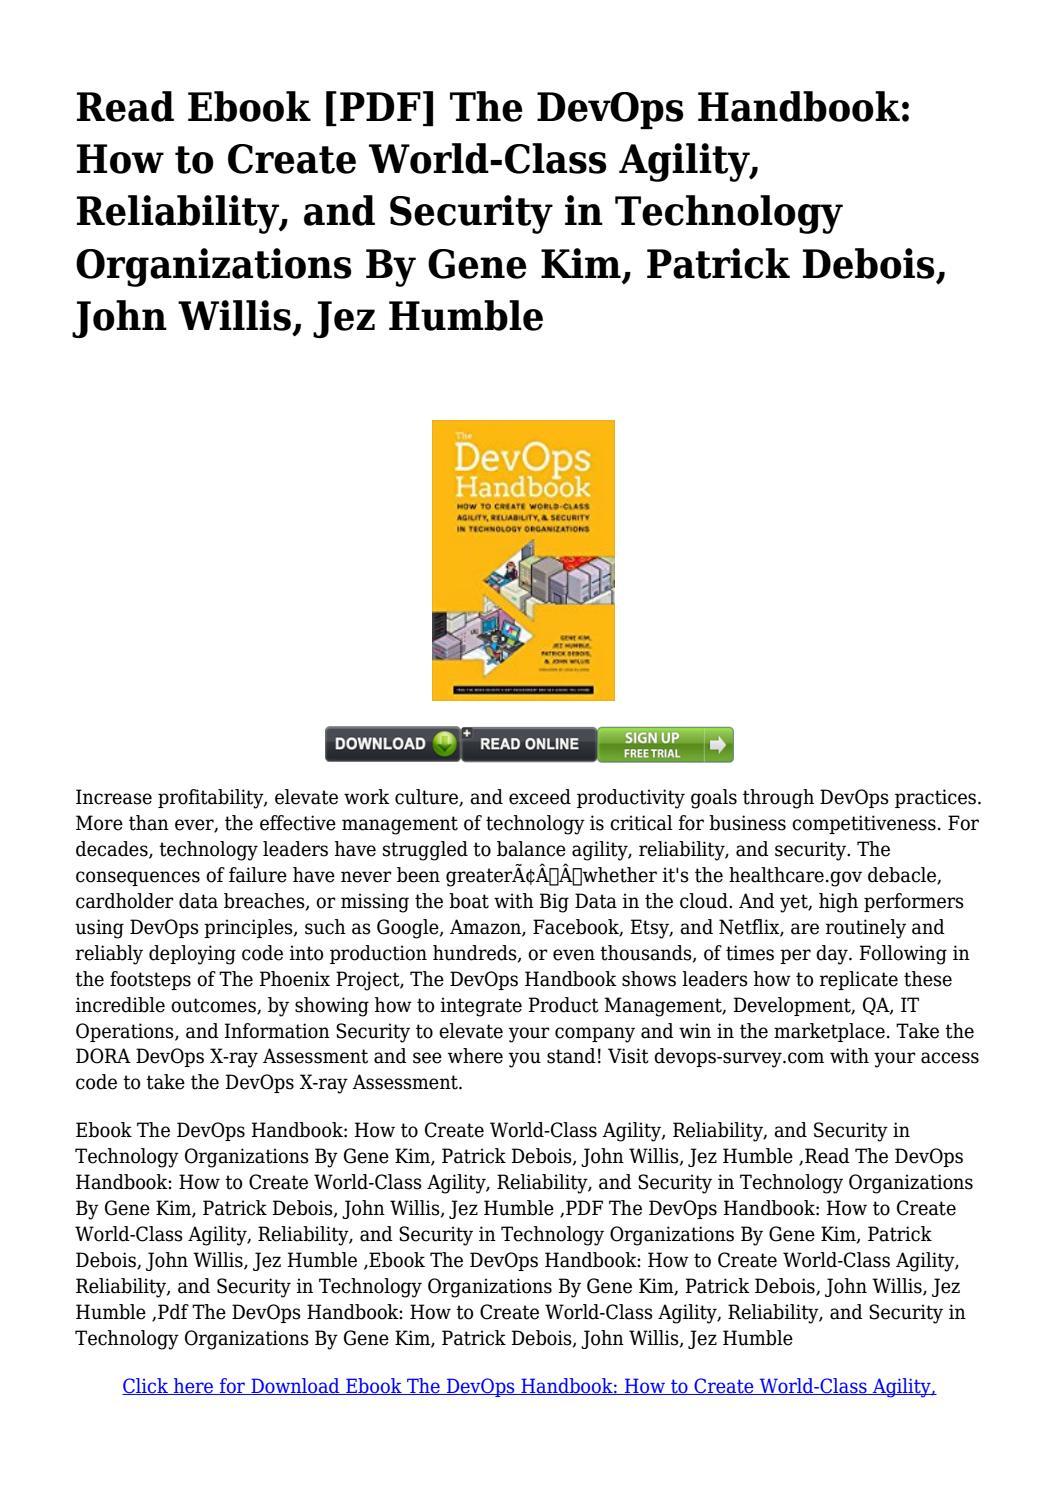 The Devops Handbook Pdf Free Download